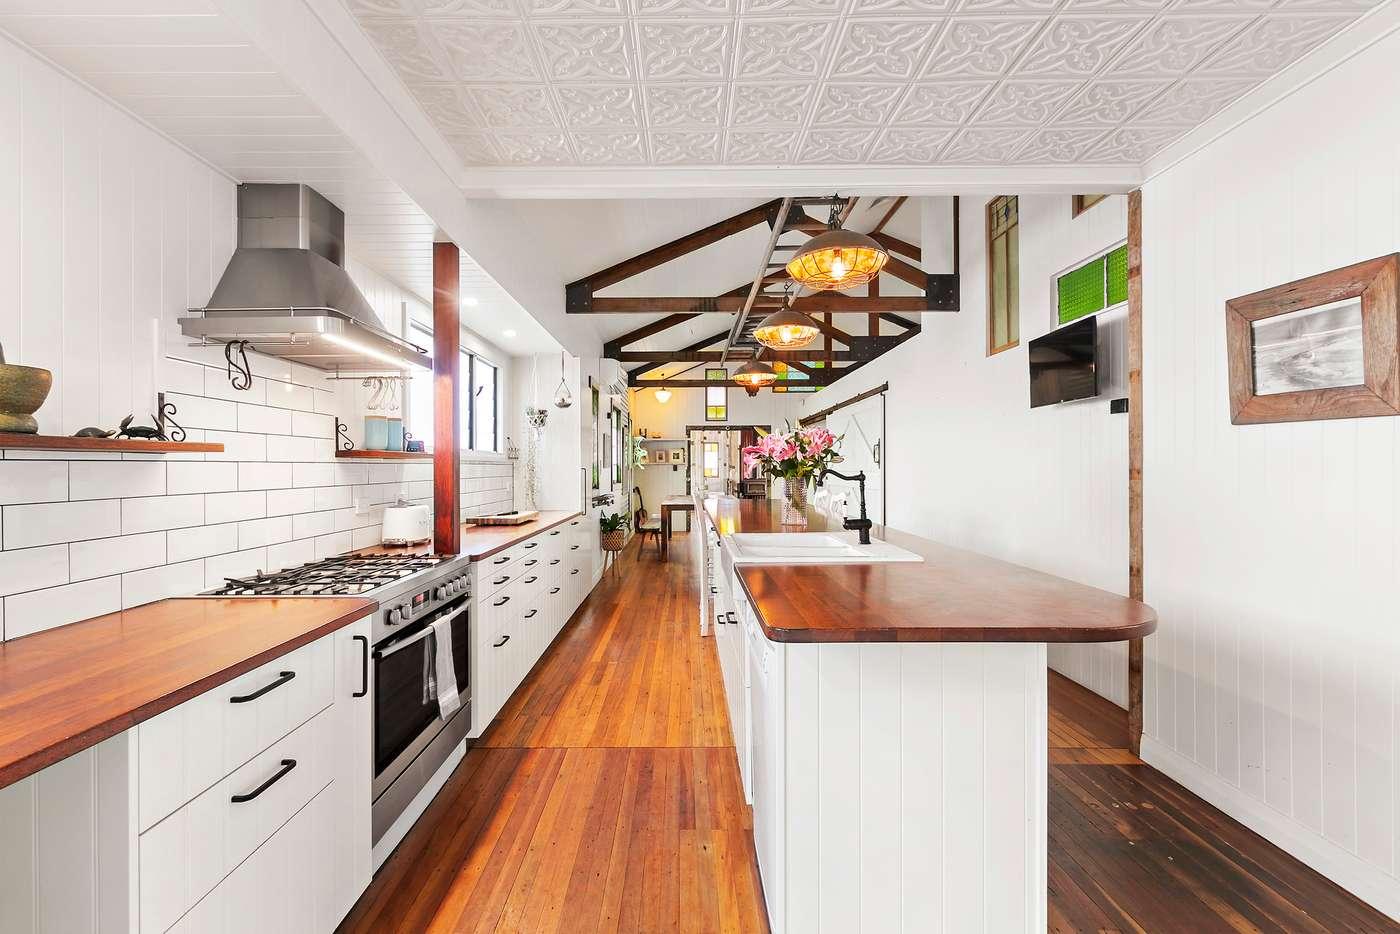 Main view of Homely house listing, 20 Twenty Fourth Avenue, Palm Beach QLD 4221